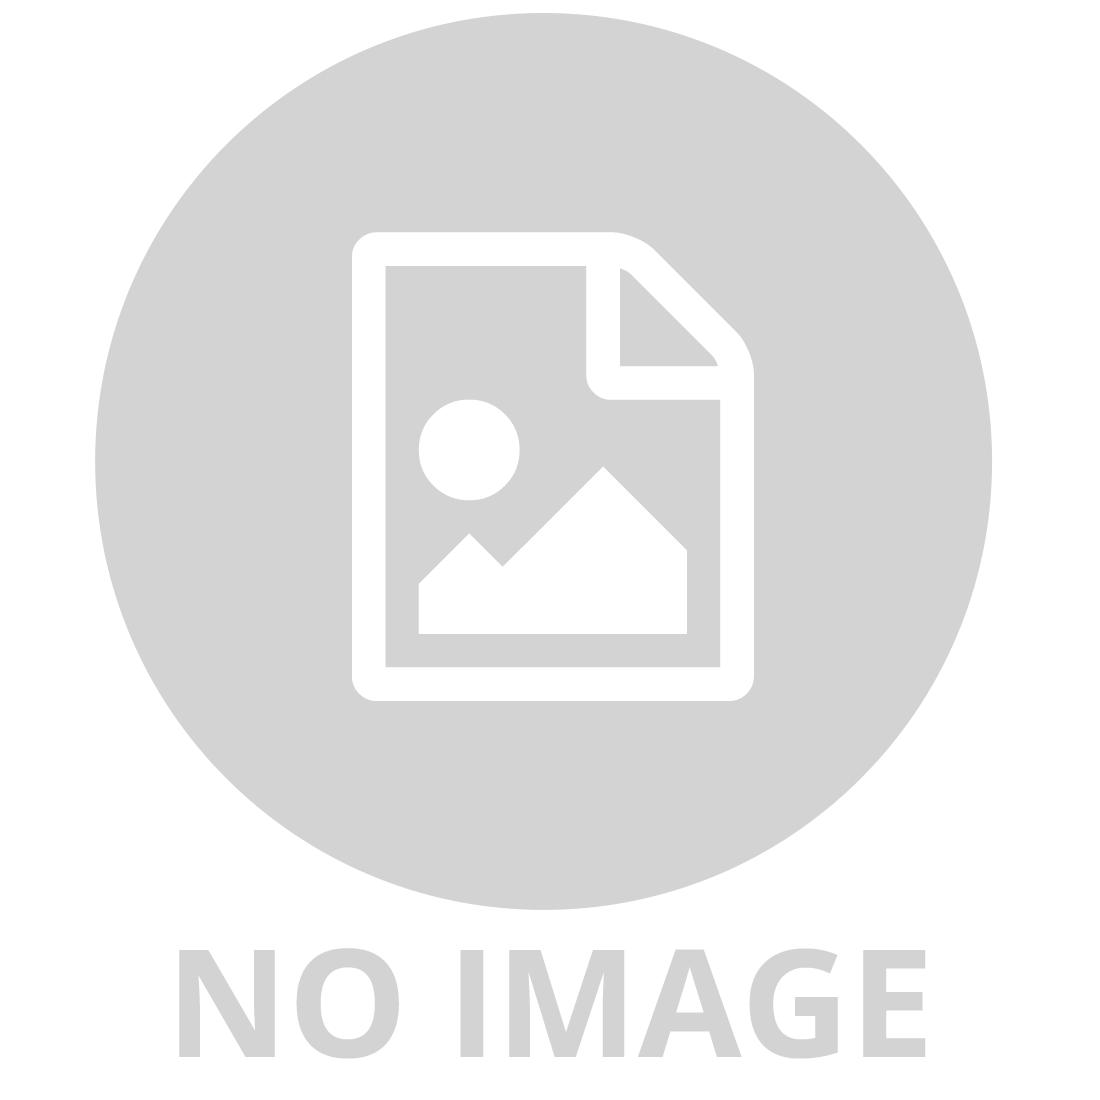 PAINT STAMPER PAD RED 15CM